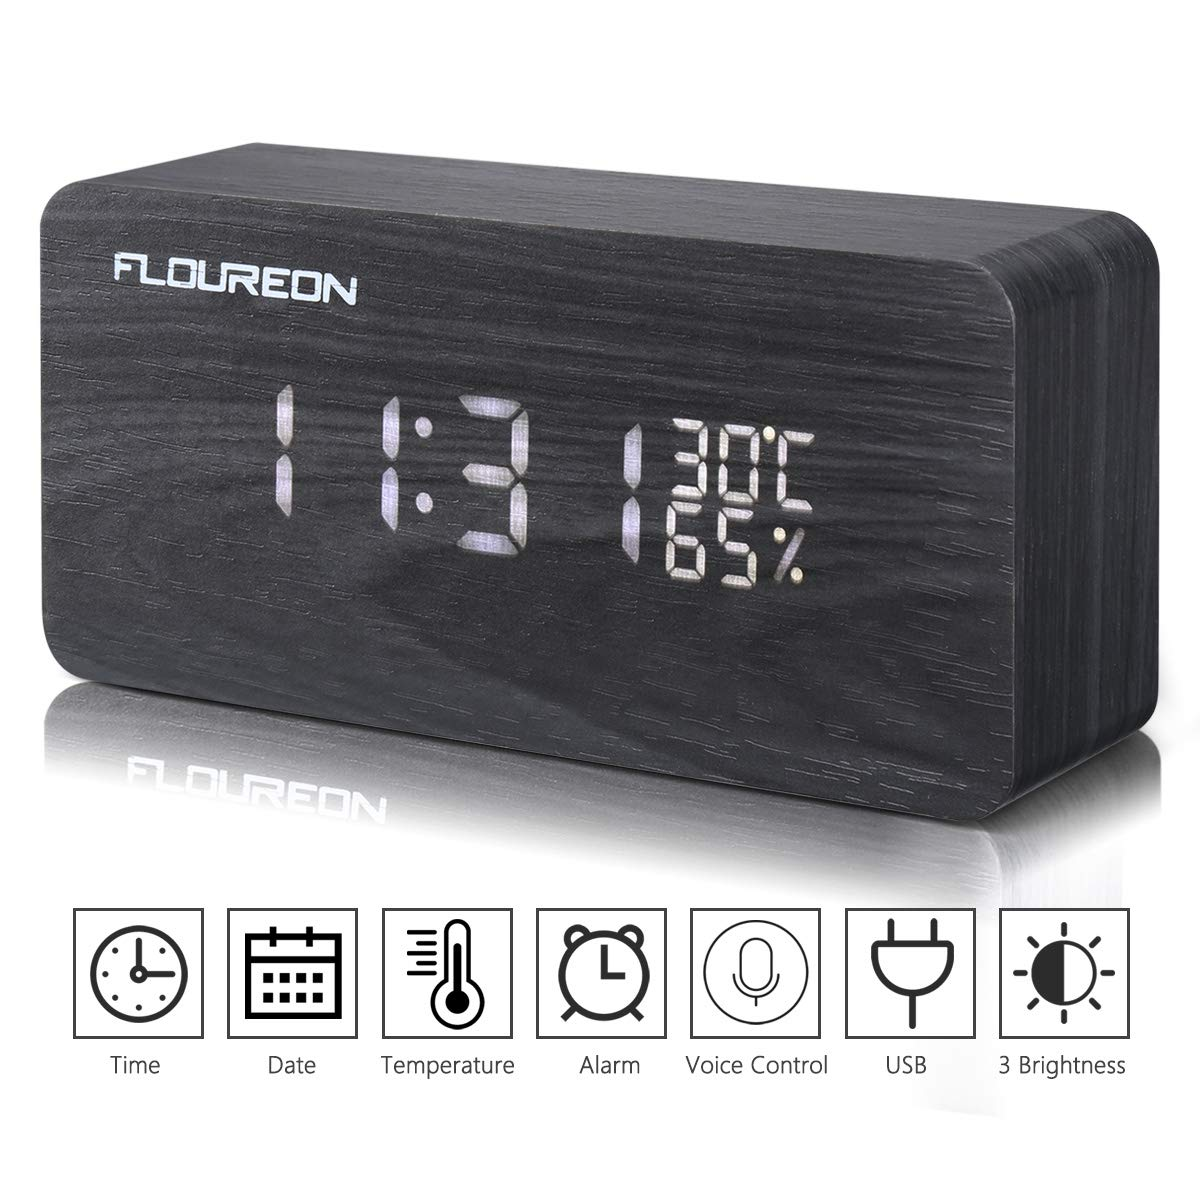 FLOUREON Wooden Alarm Clock LED Desk bedside Digital Clock Calendar/Time/Temperature/Humidity Displaying with 3 Brightness Adjustable and 3 Set of Alarm, Dual Power, Voice Control (Black)